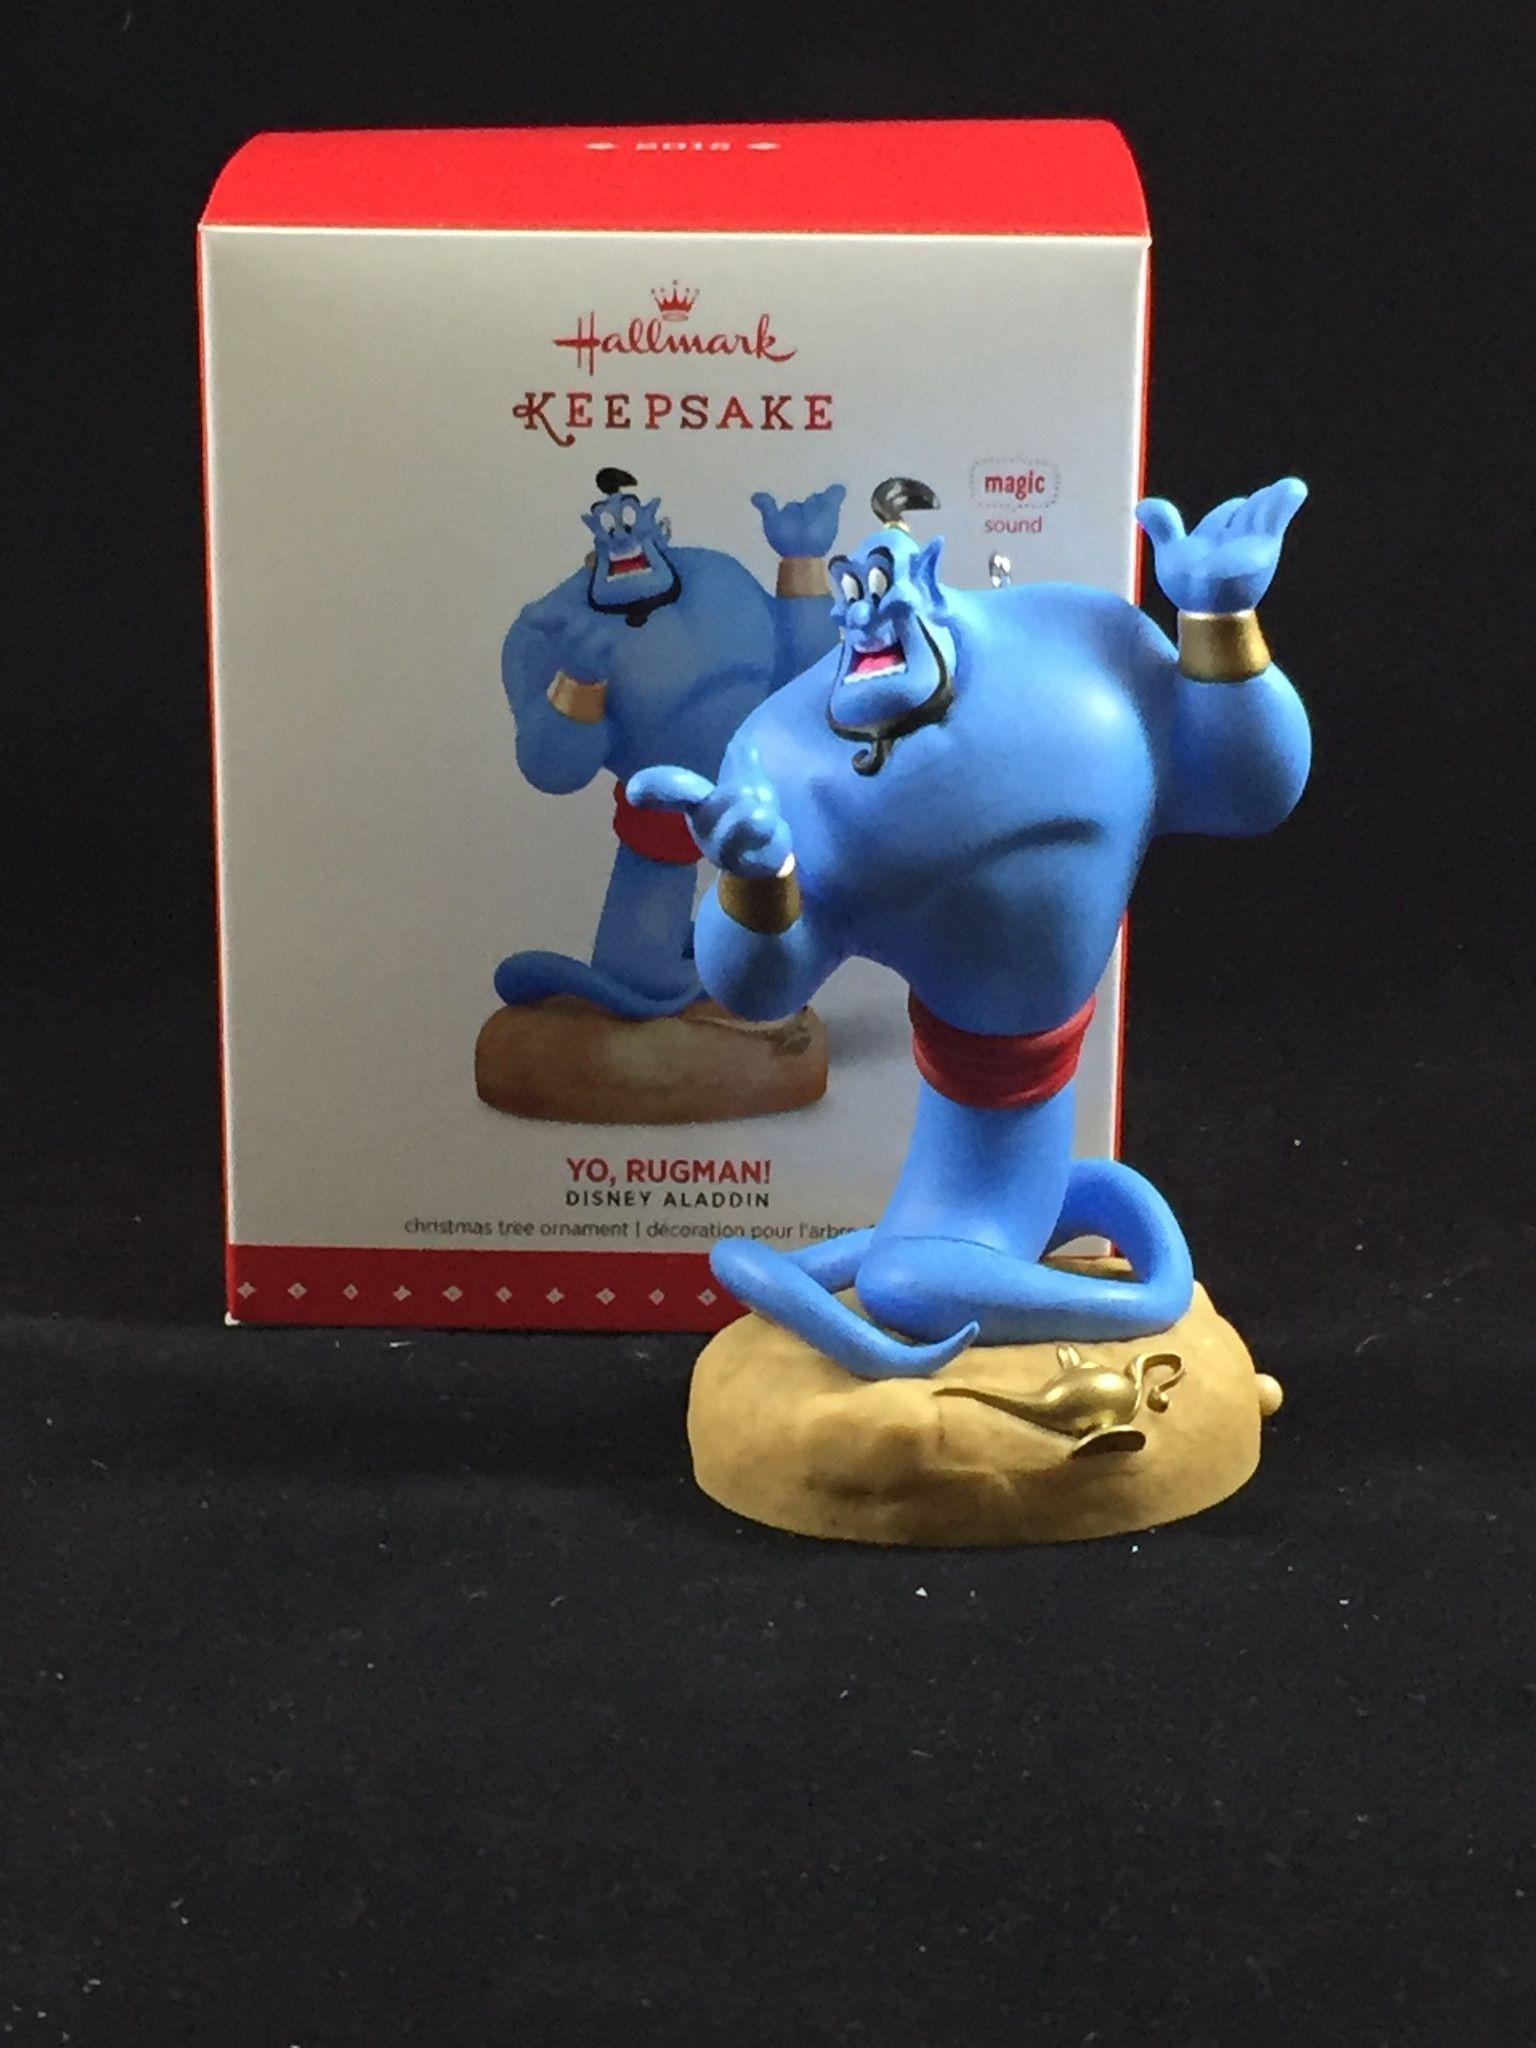 Yo Rugman Genie From Aladdin Hallmark Holiday Ornament Hallmark Disney Ornaments Disney Christmas Ornaments Disney Ornaments